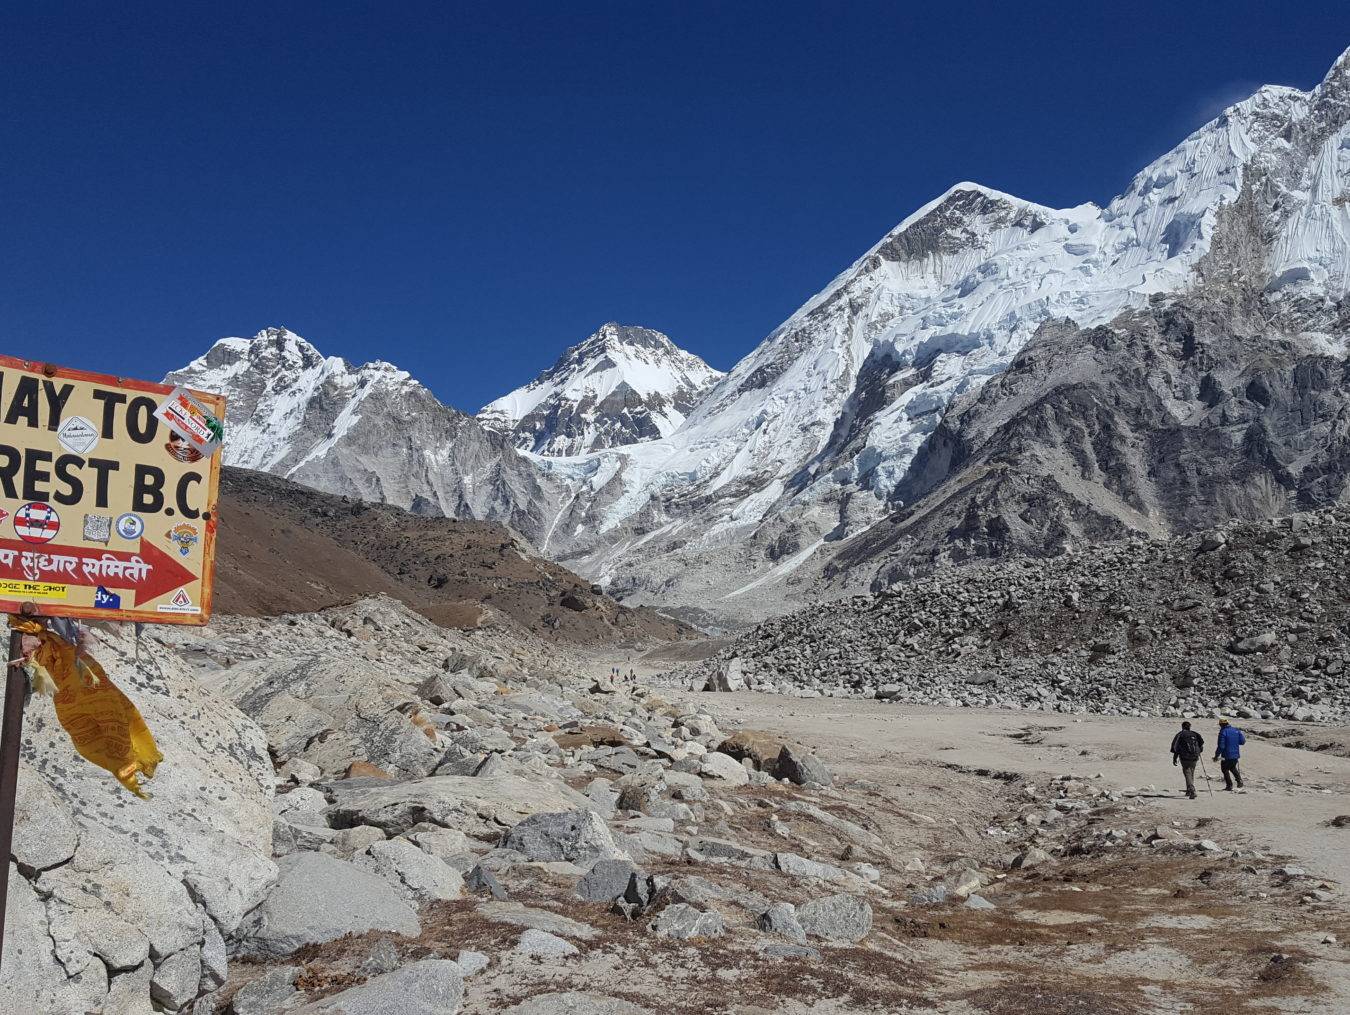 a signage near himlayan mountains saying